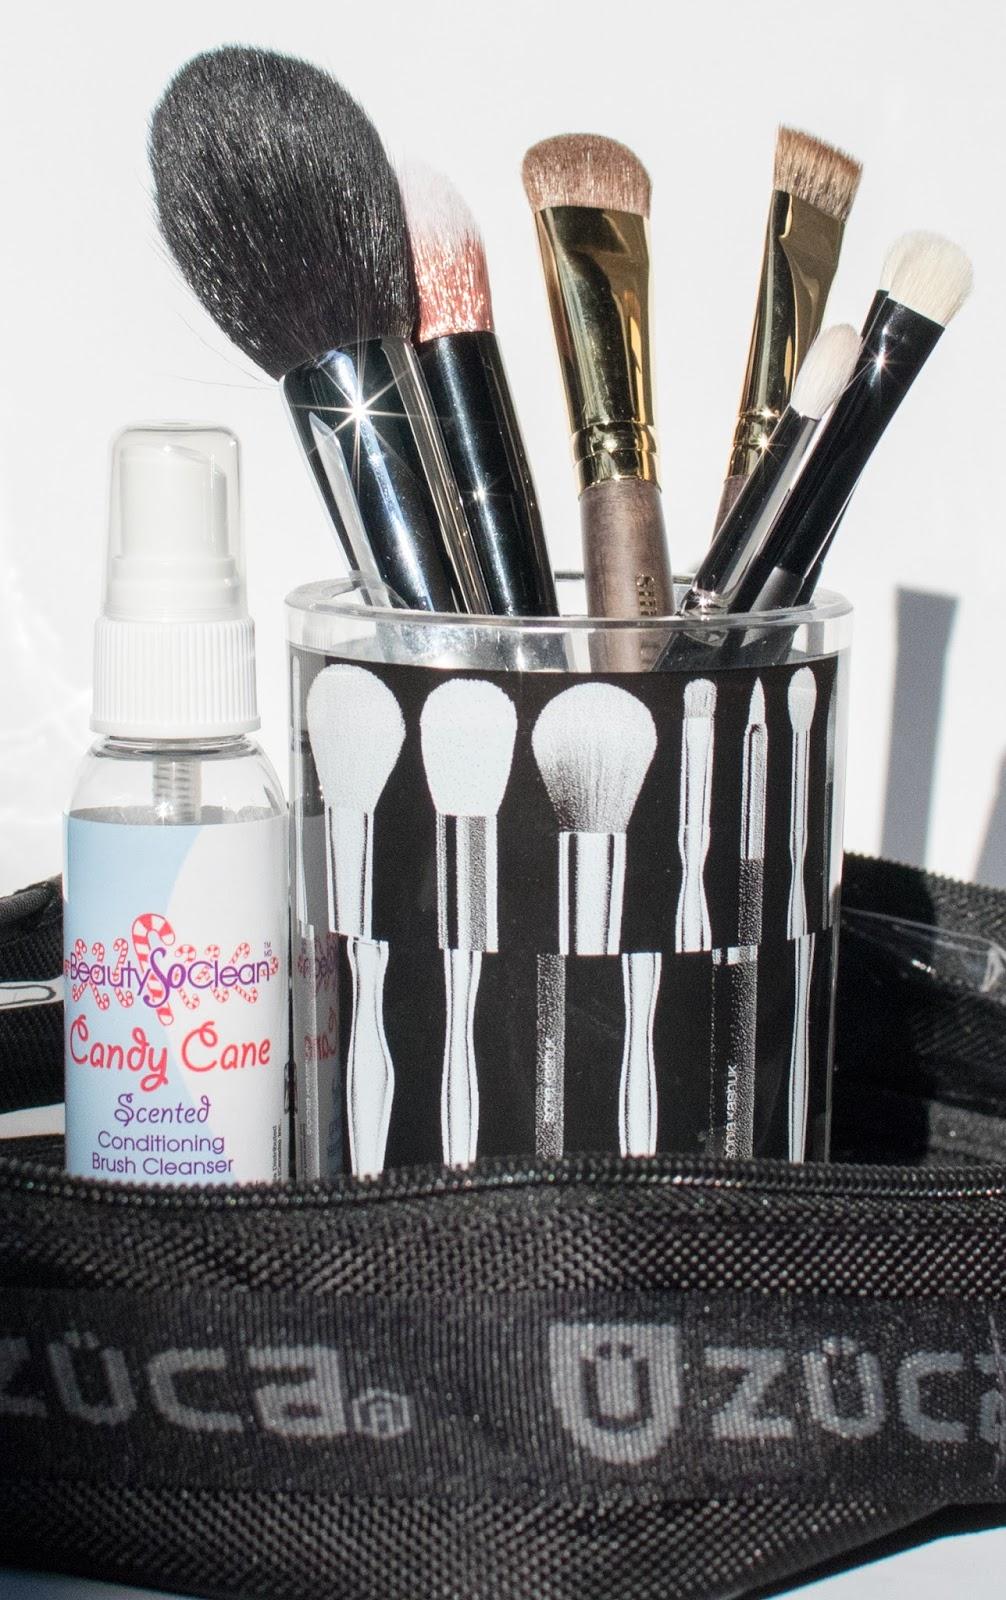 The Makeup Show LA Brushes/Brush Care Haul